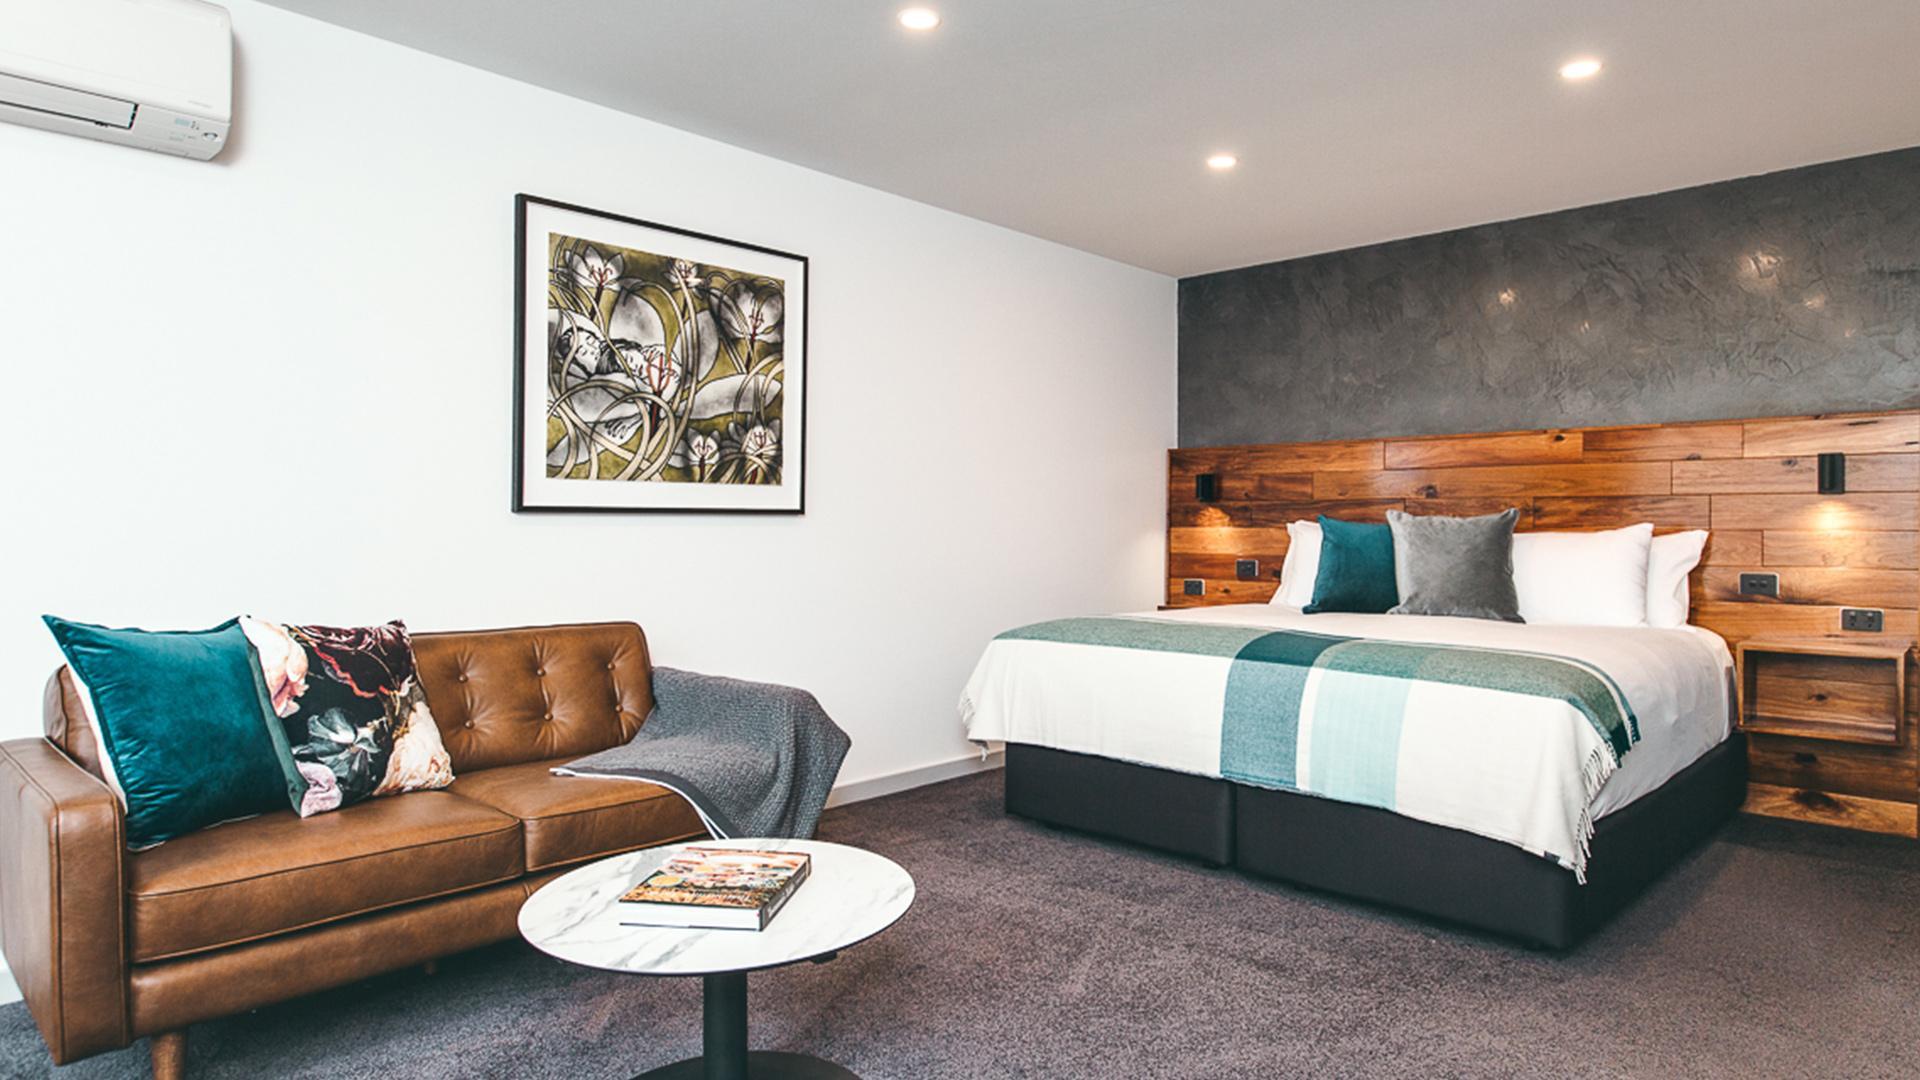 Pearce Two-Bedroom Studio image 1 at Maylands Lodge by Hobart City Council, Tasmania, Australia